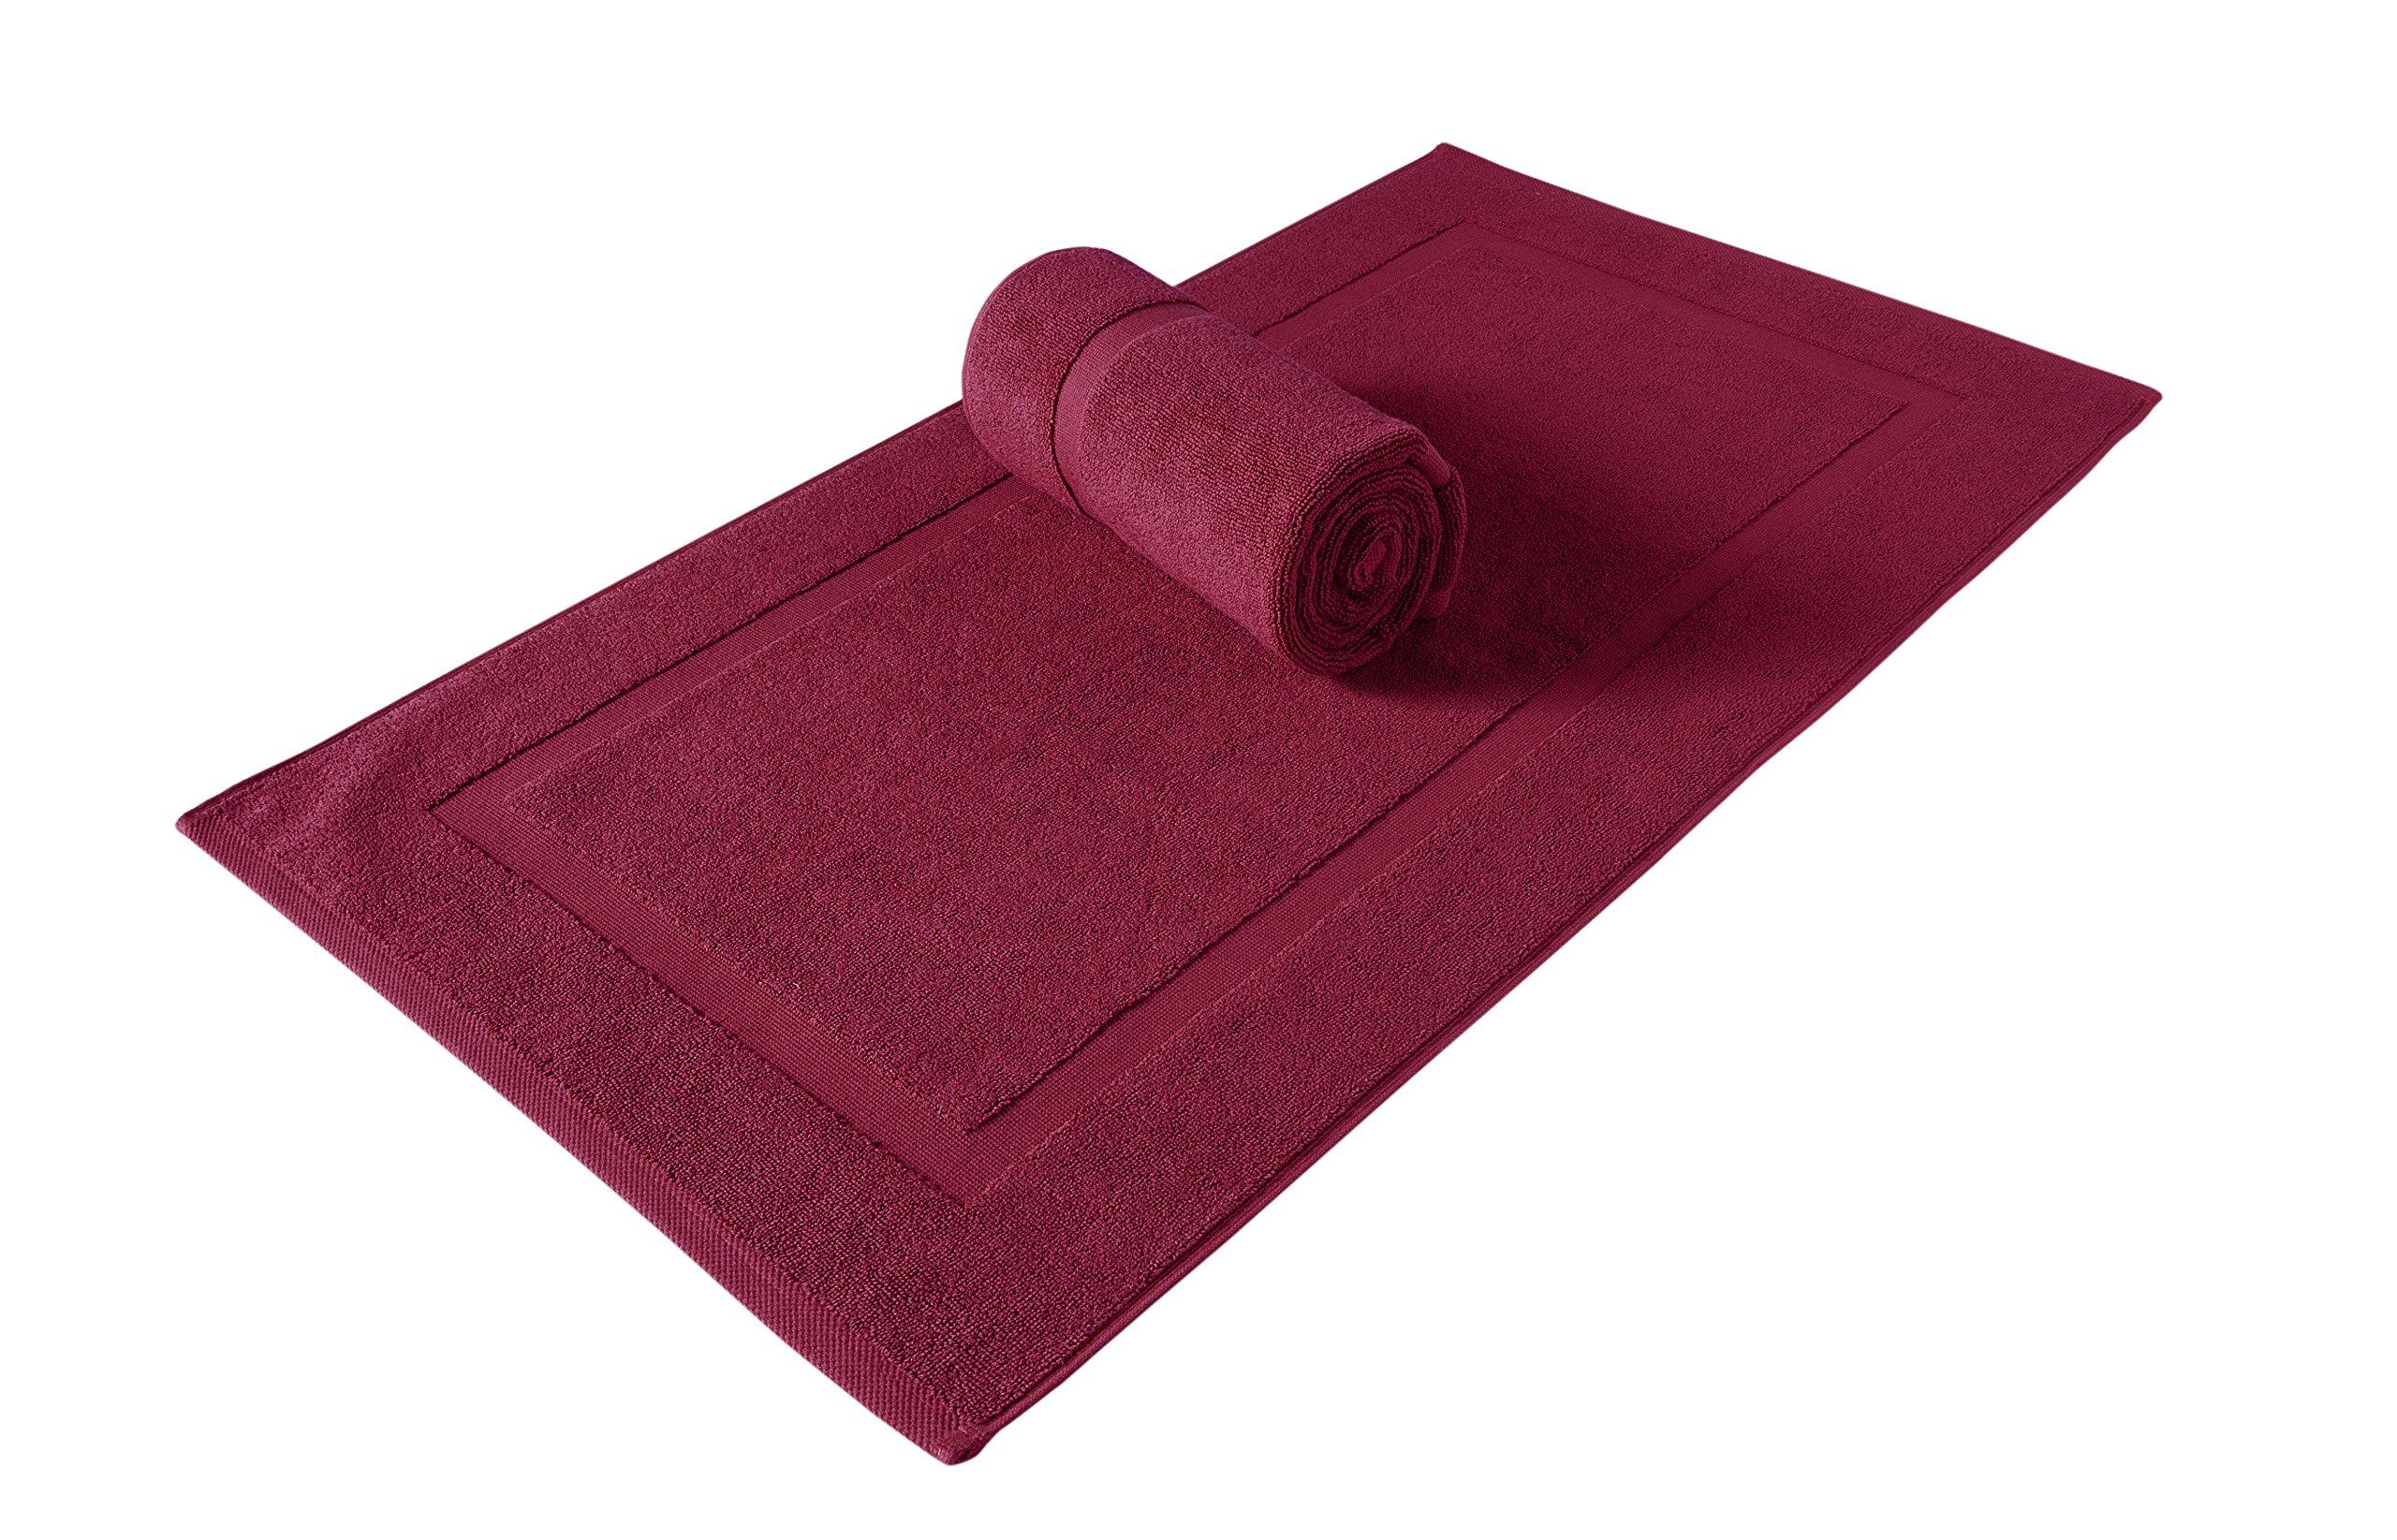 SALBAKOS Luxury Hotel Spa 100% Turkish Cotton Banded Panel Bath Mat Set 900gsm! 20''x34'' (Wine, 2 Pack)